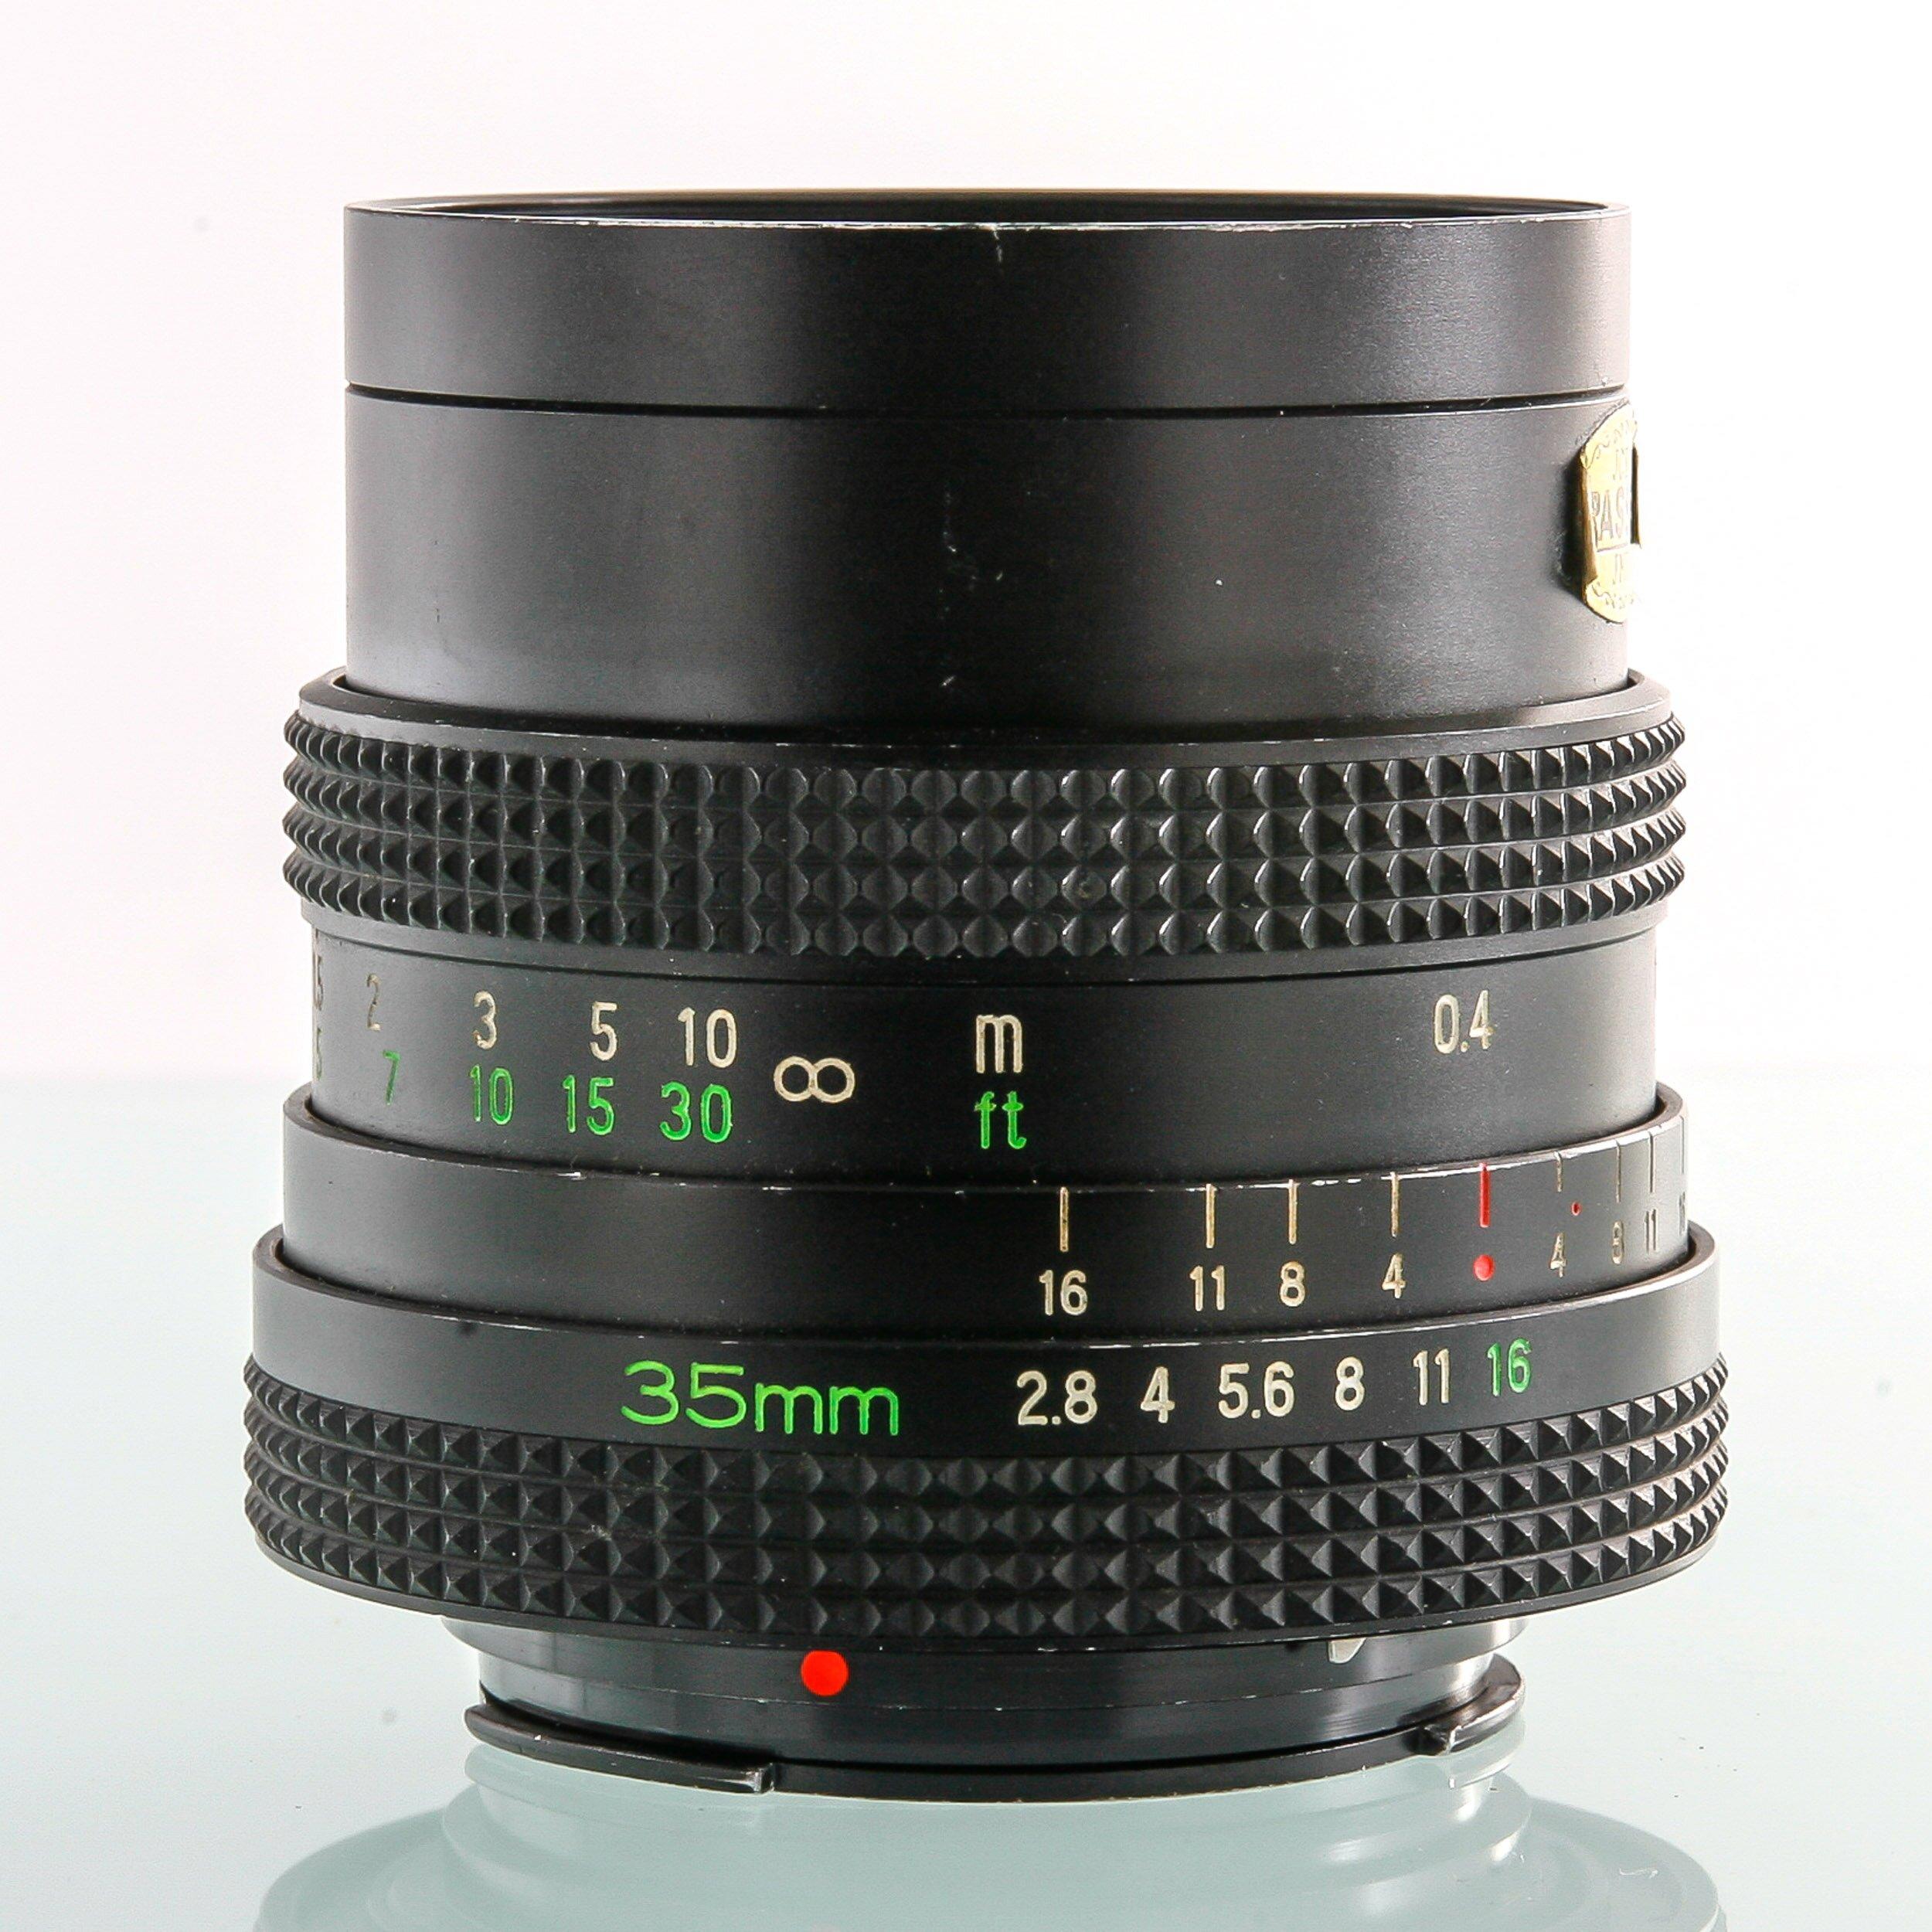 Rollei SLR F2.8 35mm Rolleinar MC